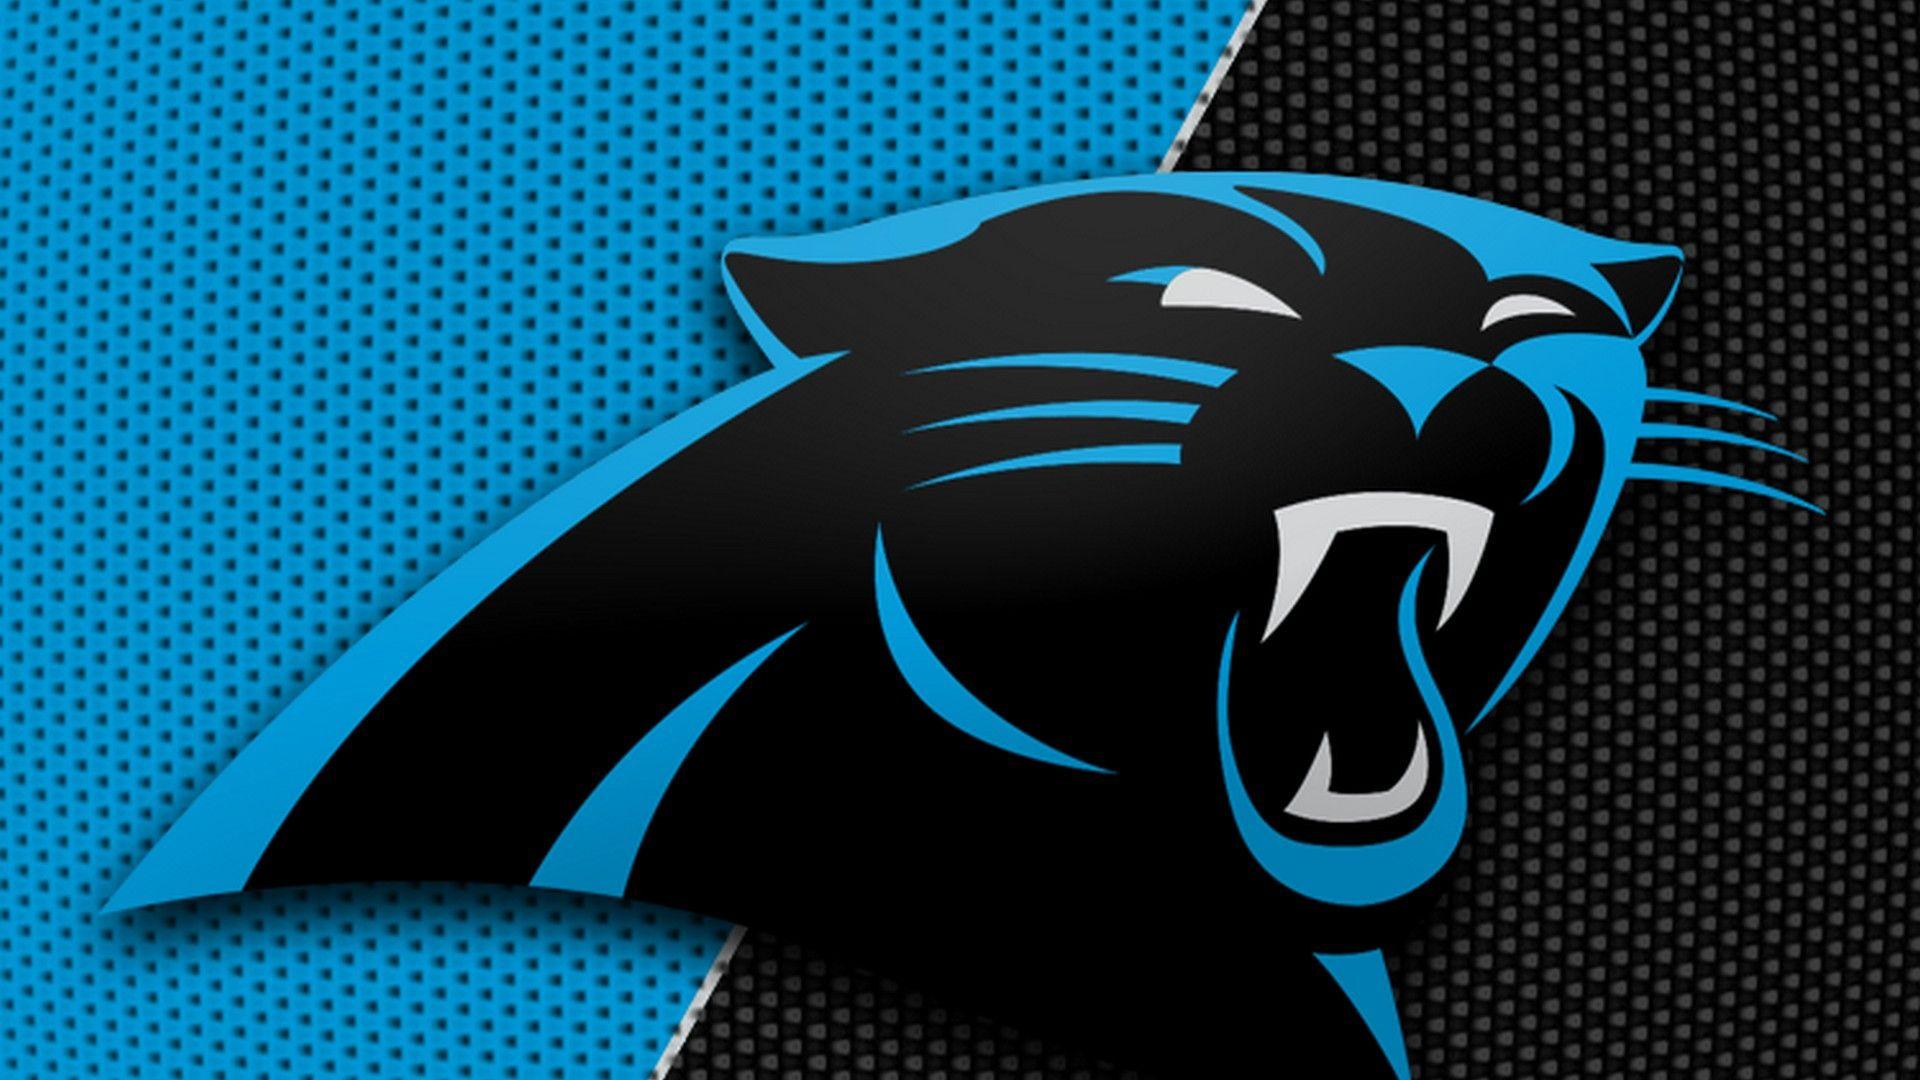 Backgrounds Carolina Panthers Hd 2021 Nfl Football Wallpapers Carolina Panthers Wallpaper Nfl Football Wallpaper Carolina Panthers